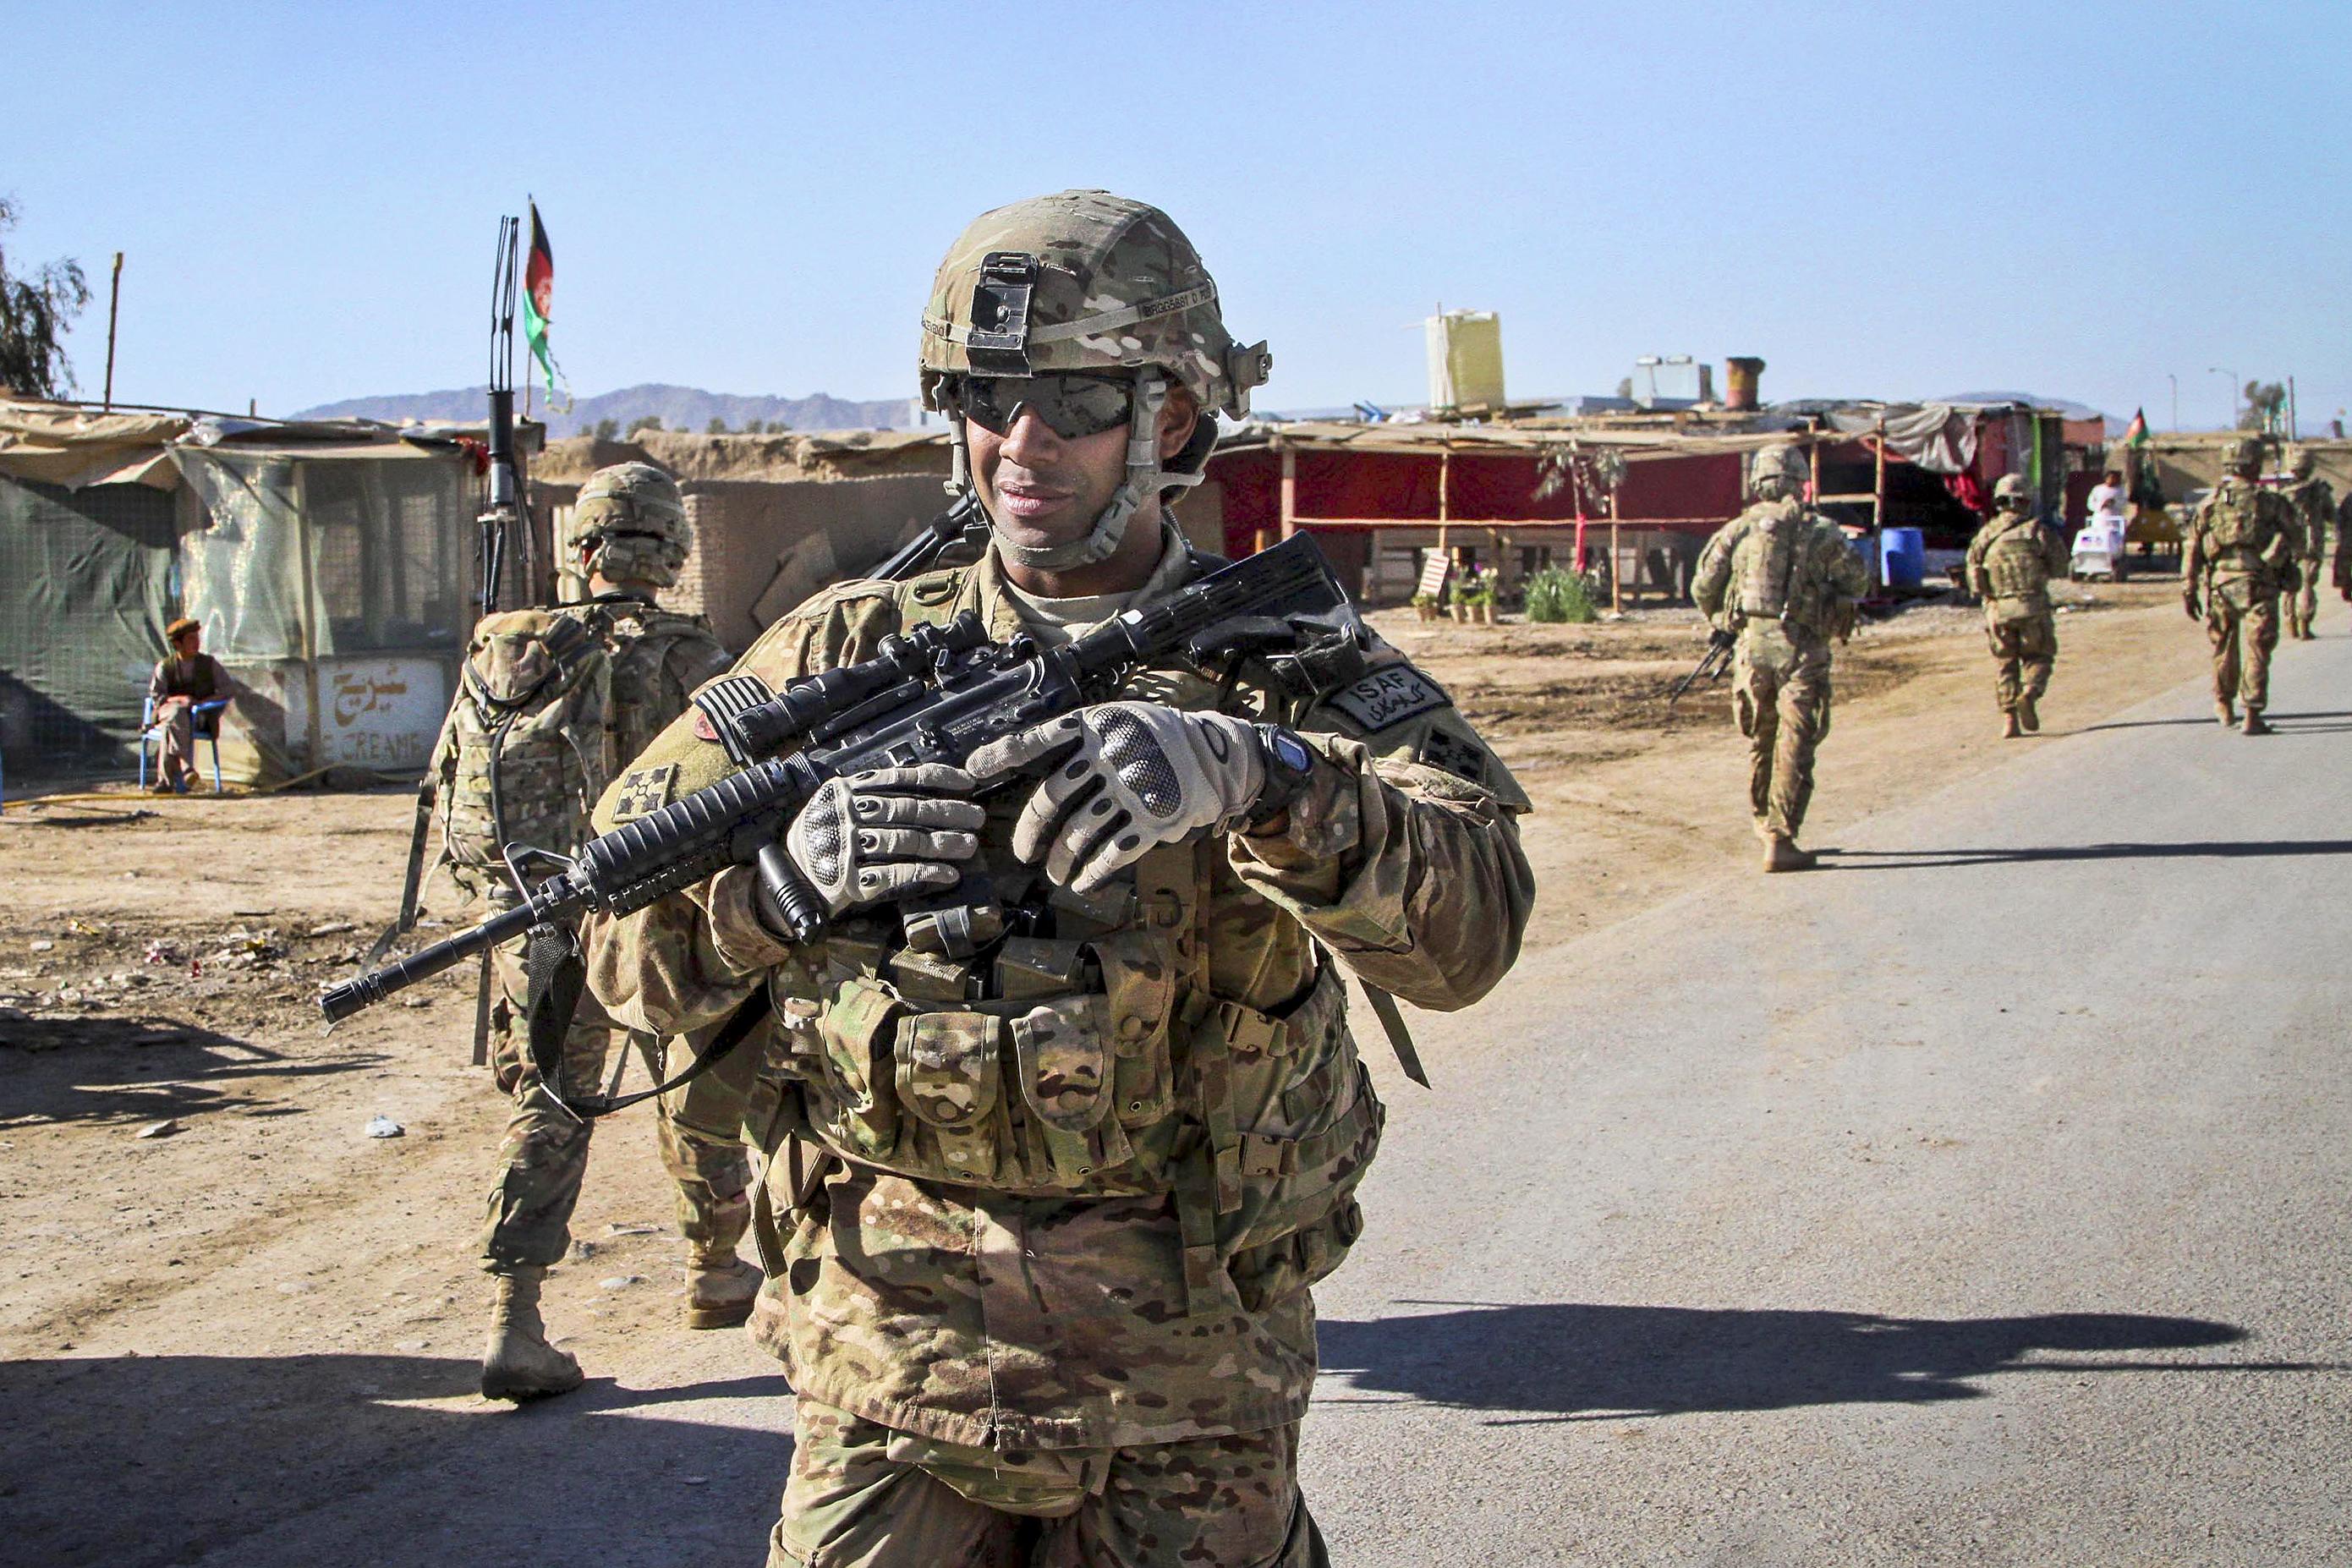 US Army Sgt Gilberto Garcia Acevedo Directs A Presence Patrol In Kandahar Province